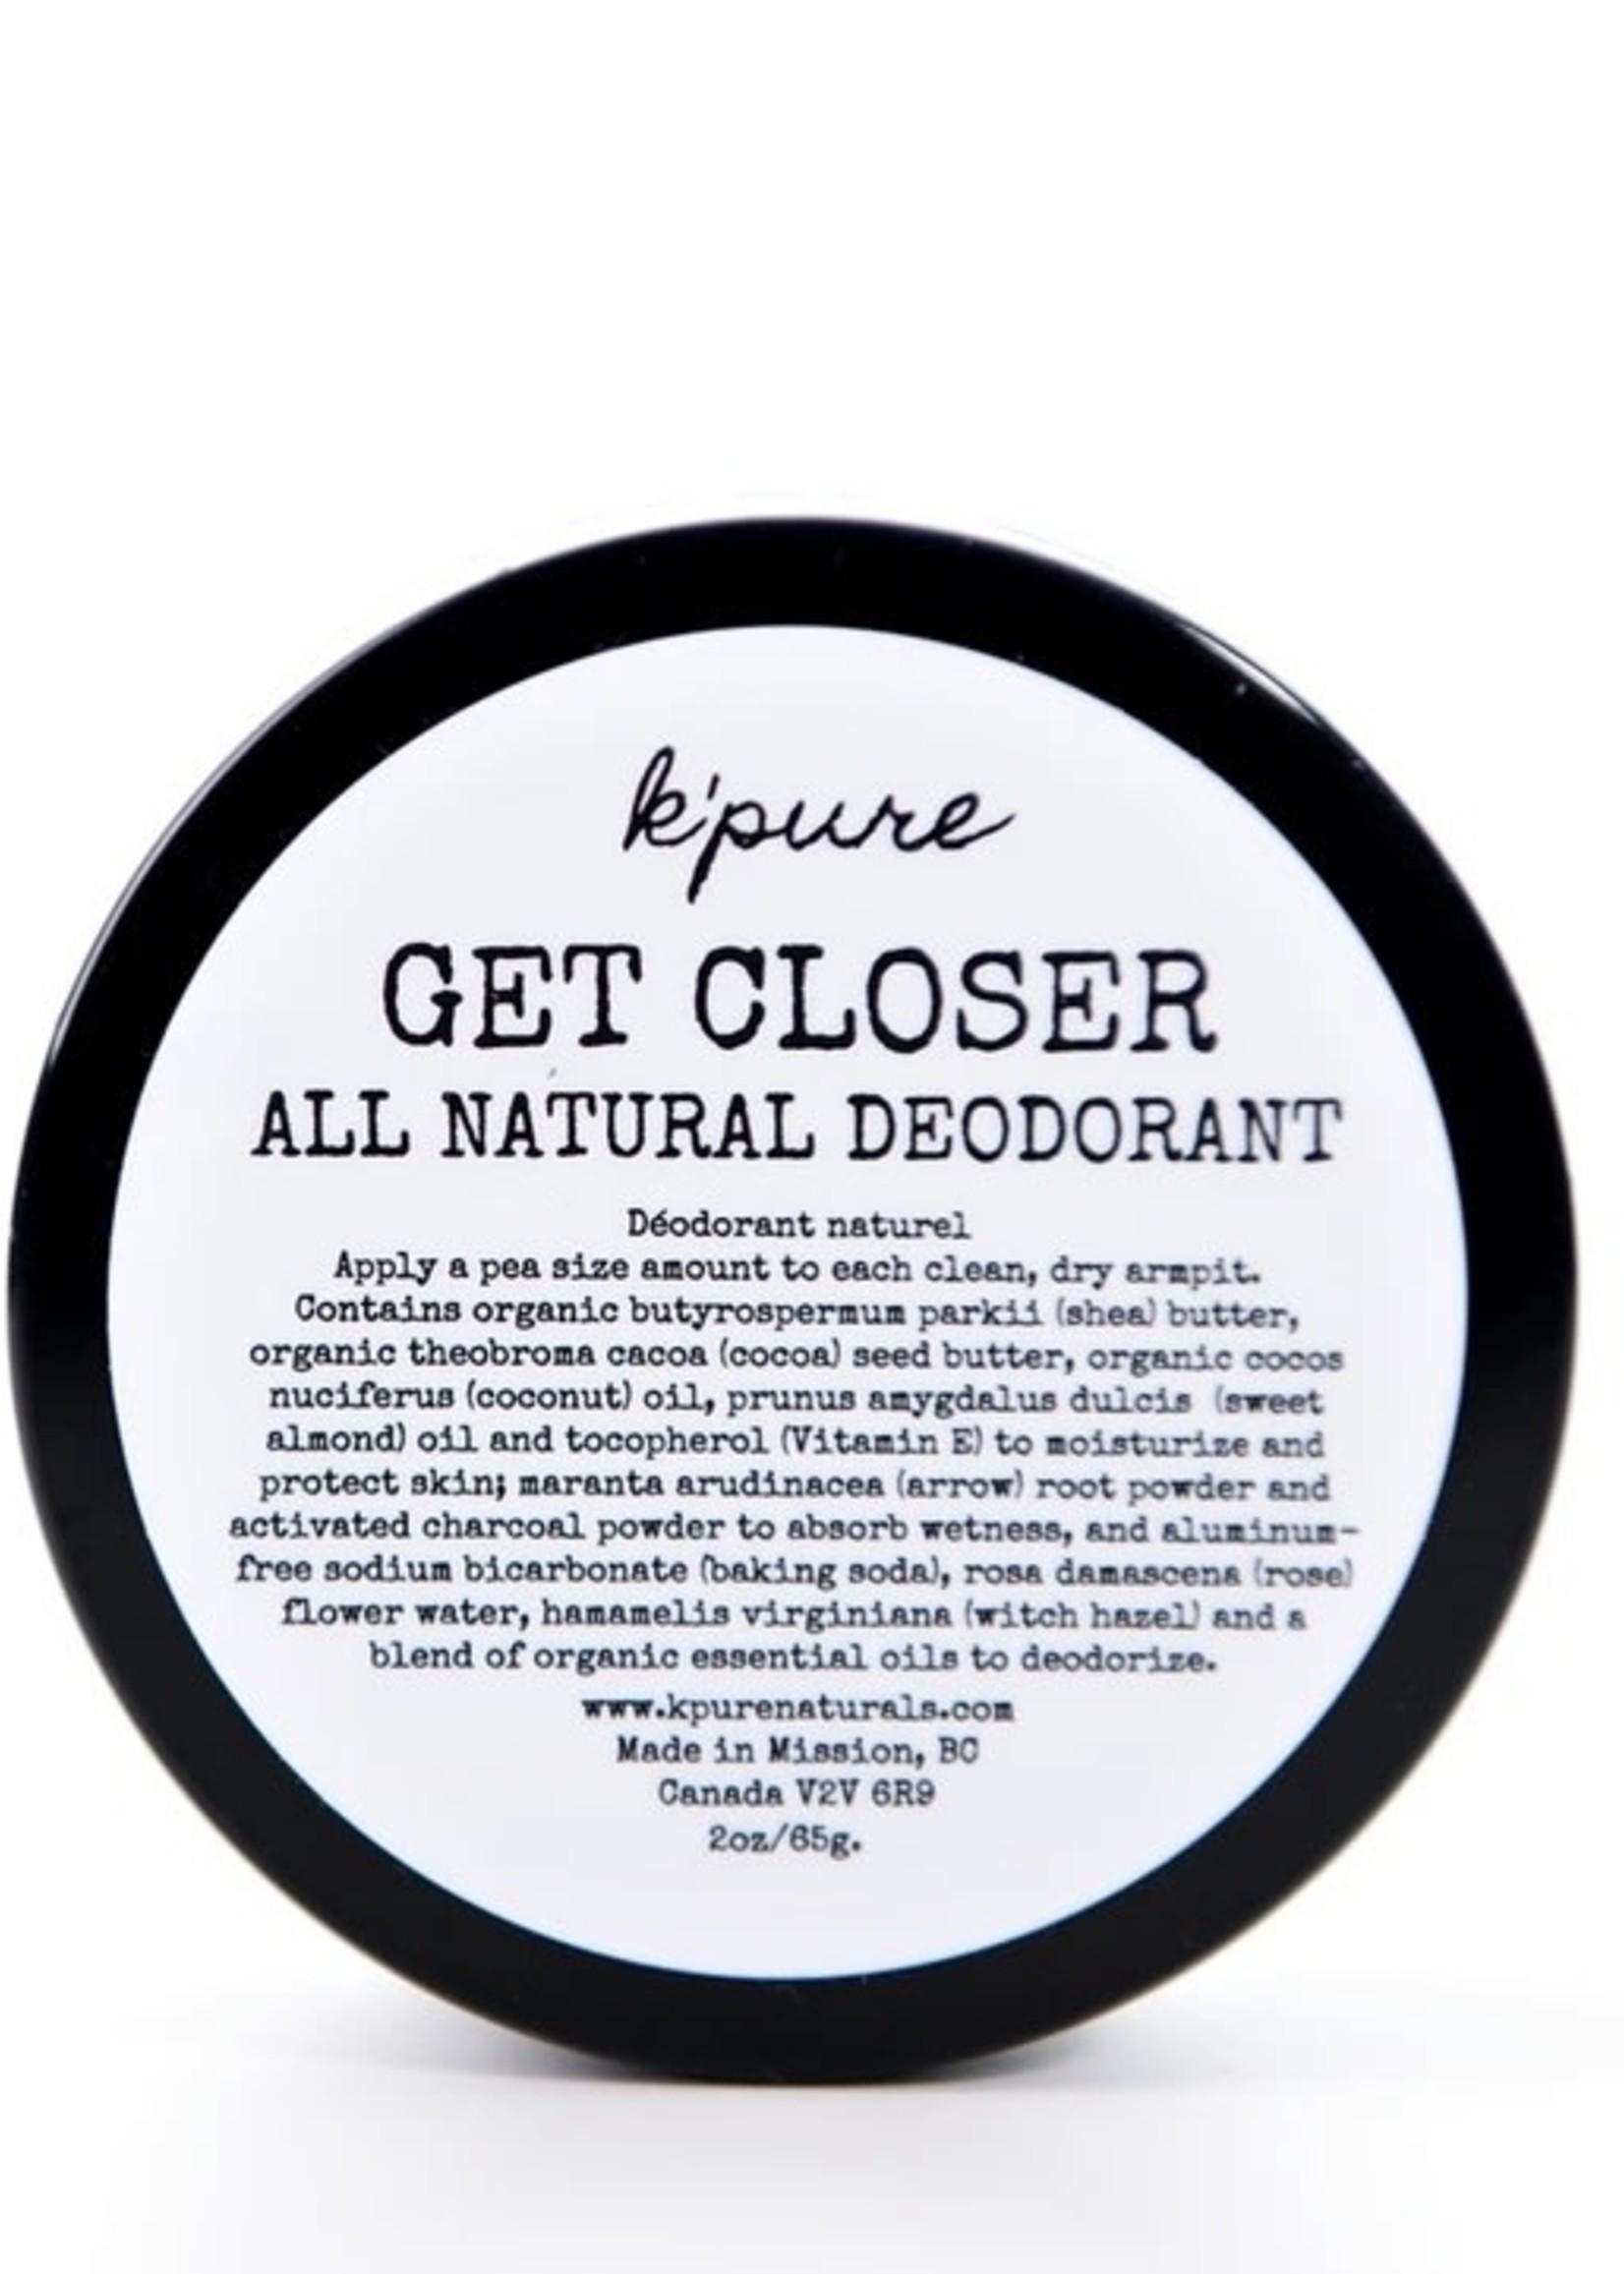 K'PURE Get Closer All Natural Deodorant 4oz ORIGINAL